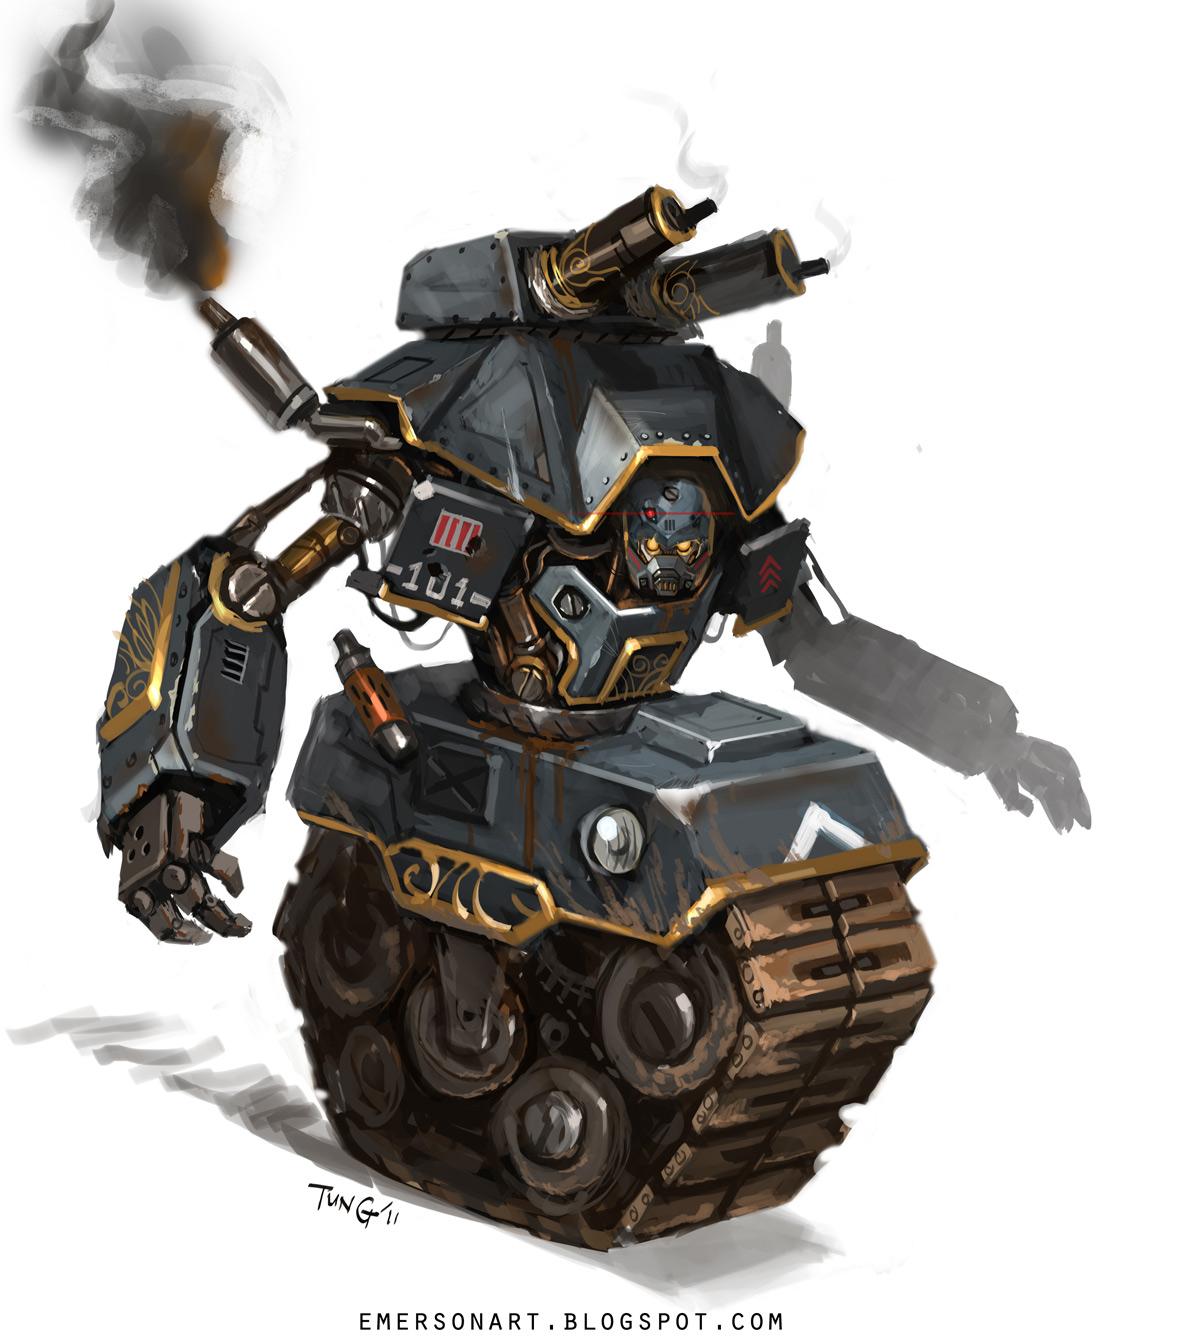 Concept Robots Concept Robots By Emerson Tung